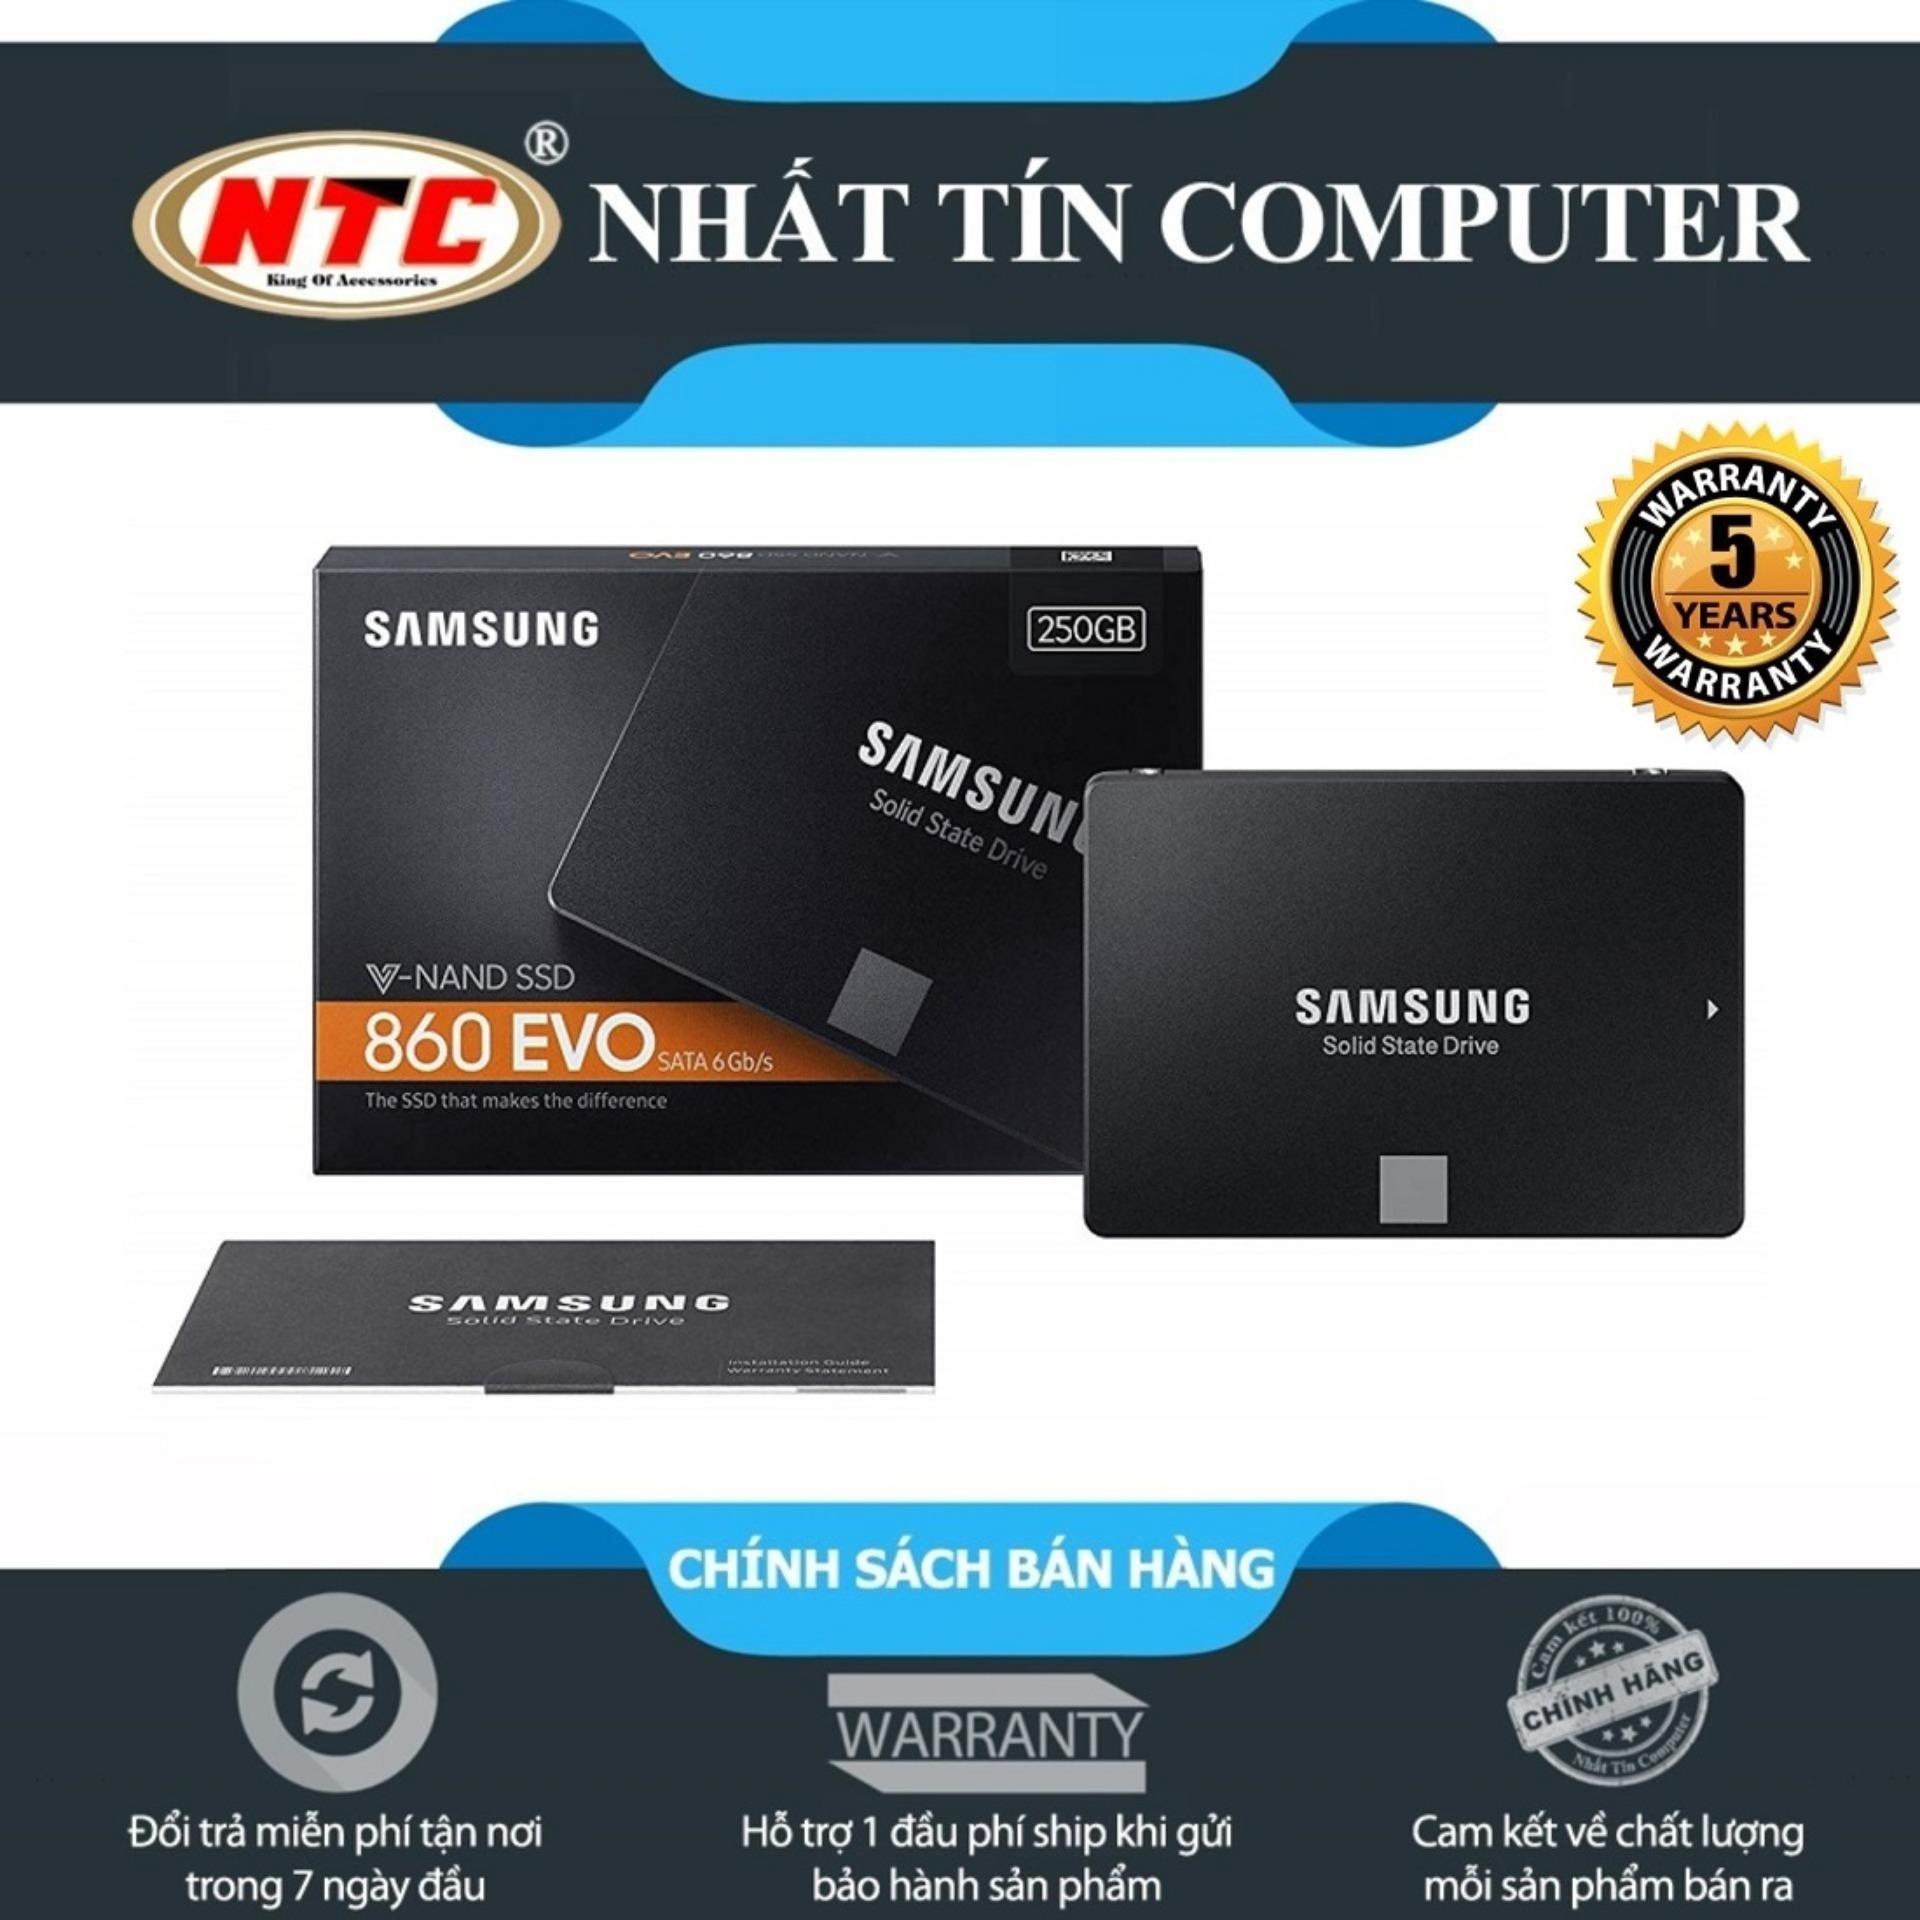 Ổ cứng SSD Samsung 860 Evo 250GB 2.5-Inch SATA III - box Anh (Đen)